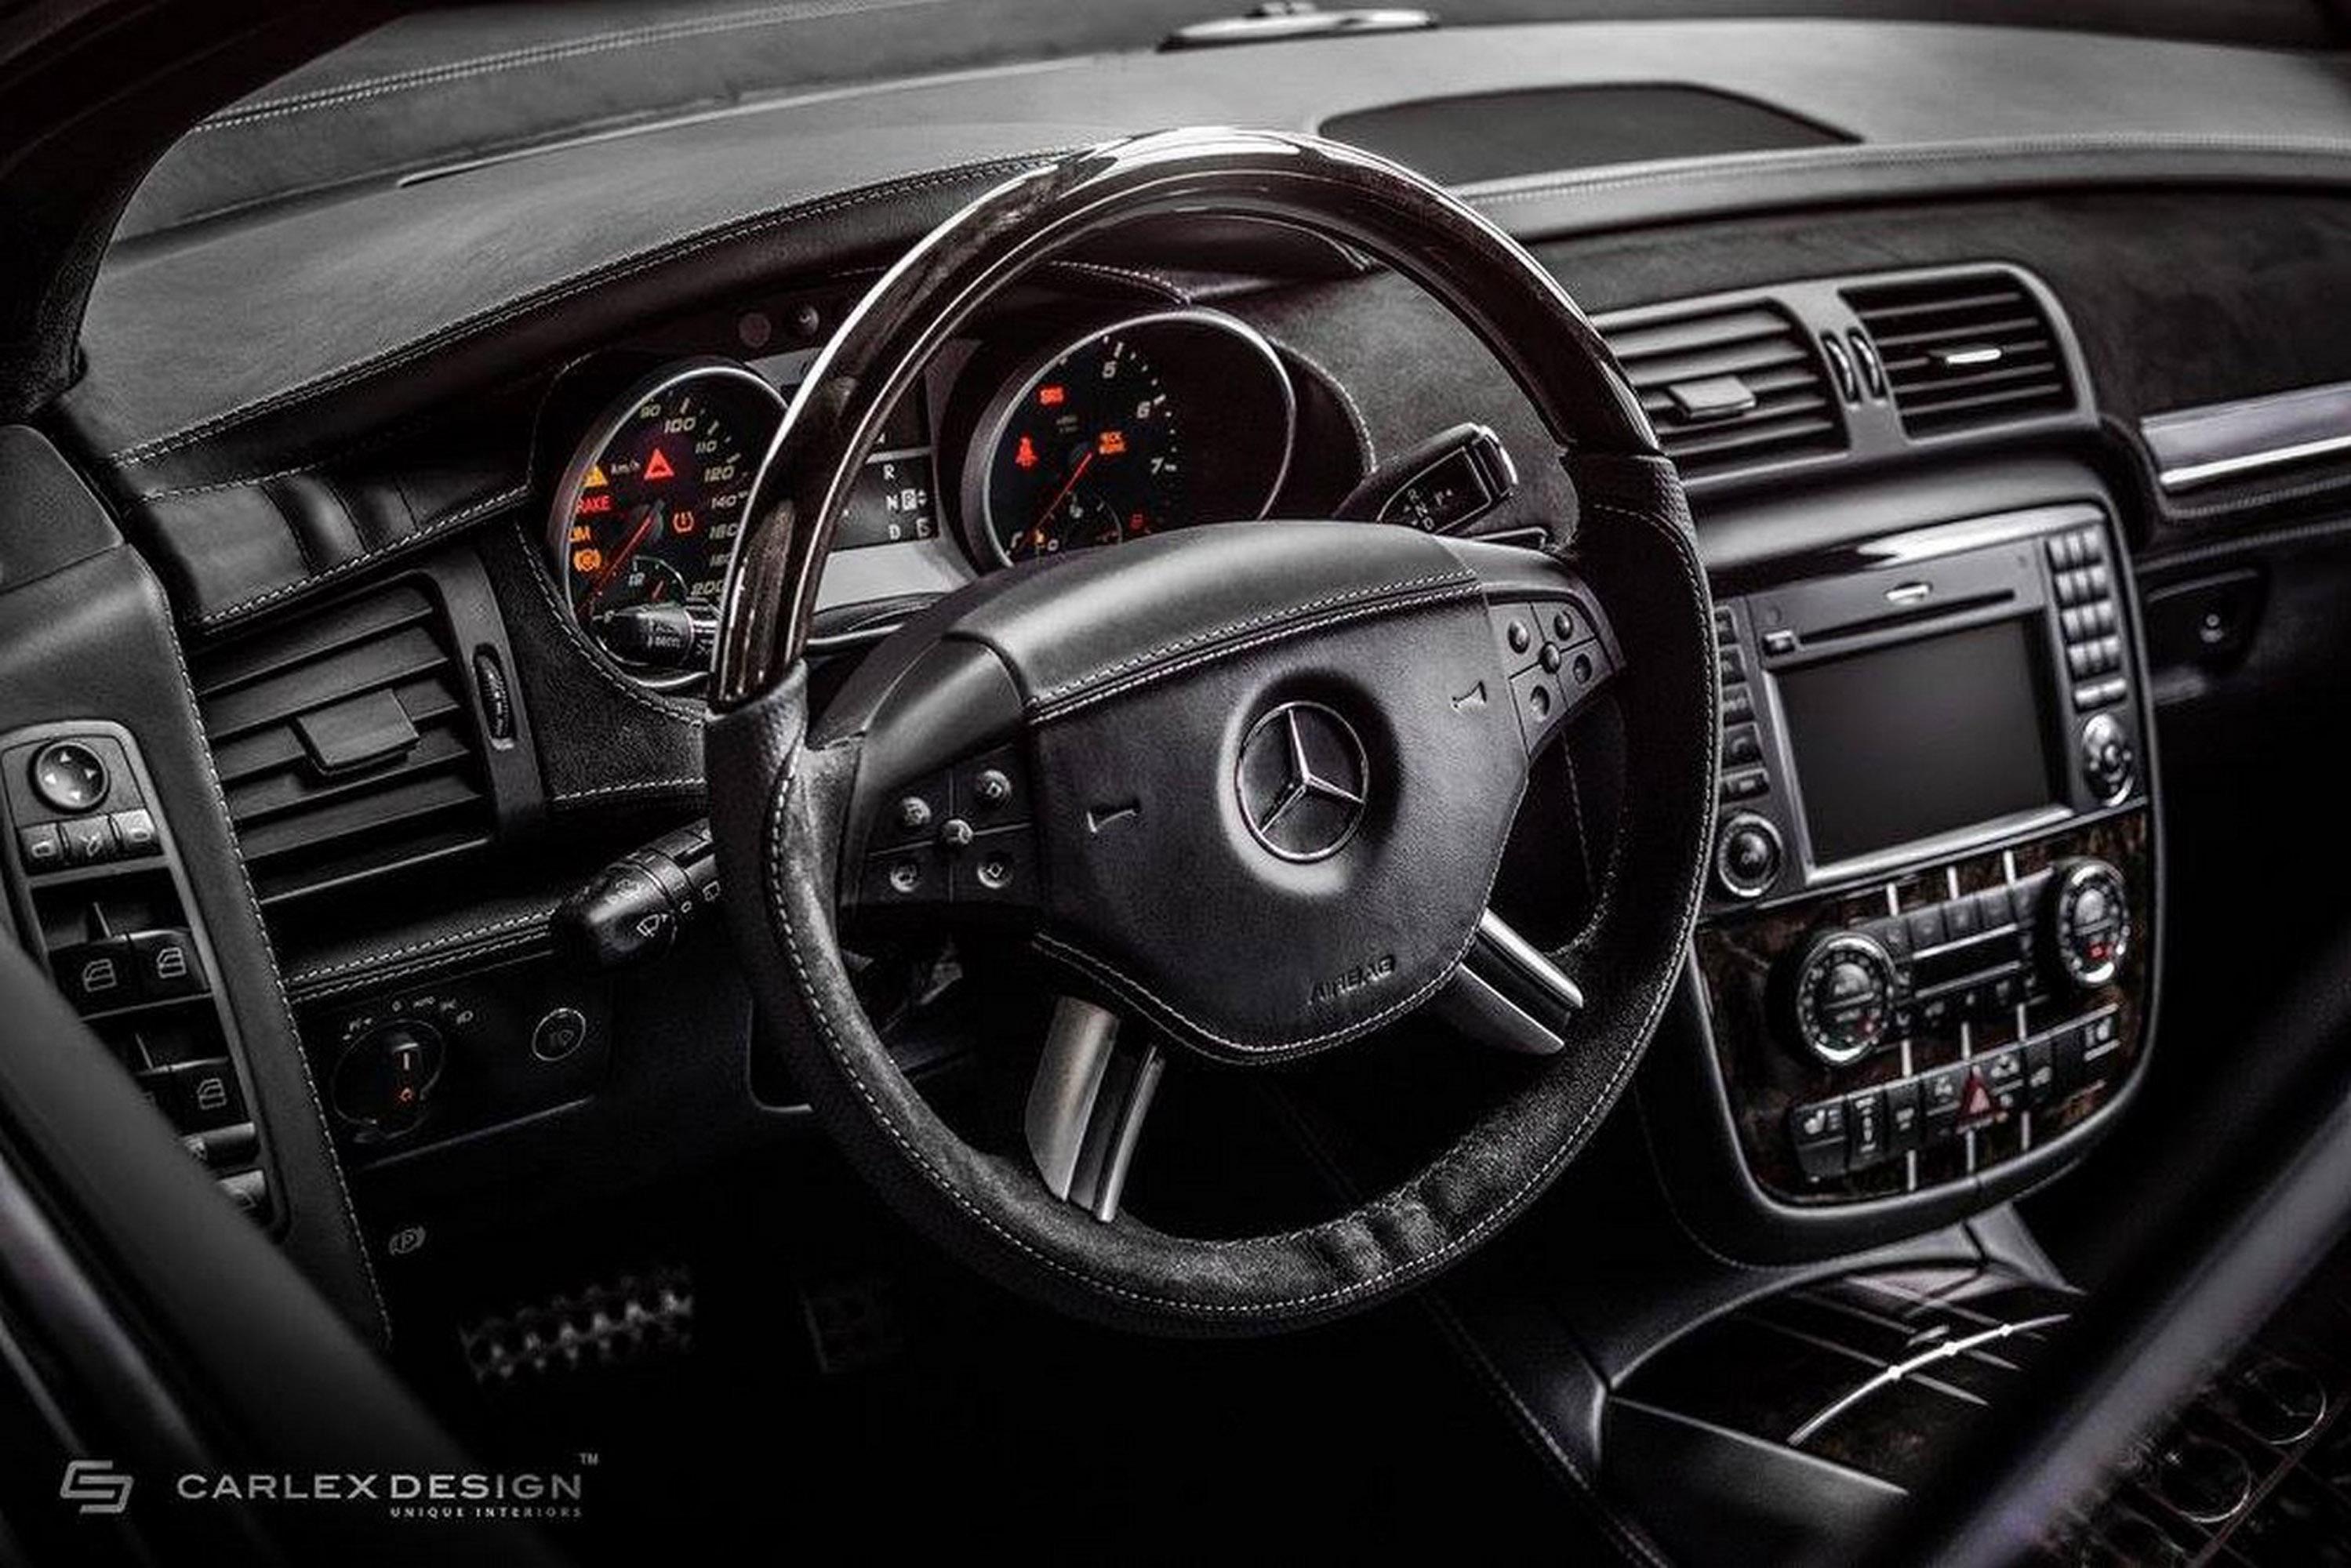 Carlex Design Improves Mercedes G Class